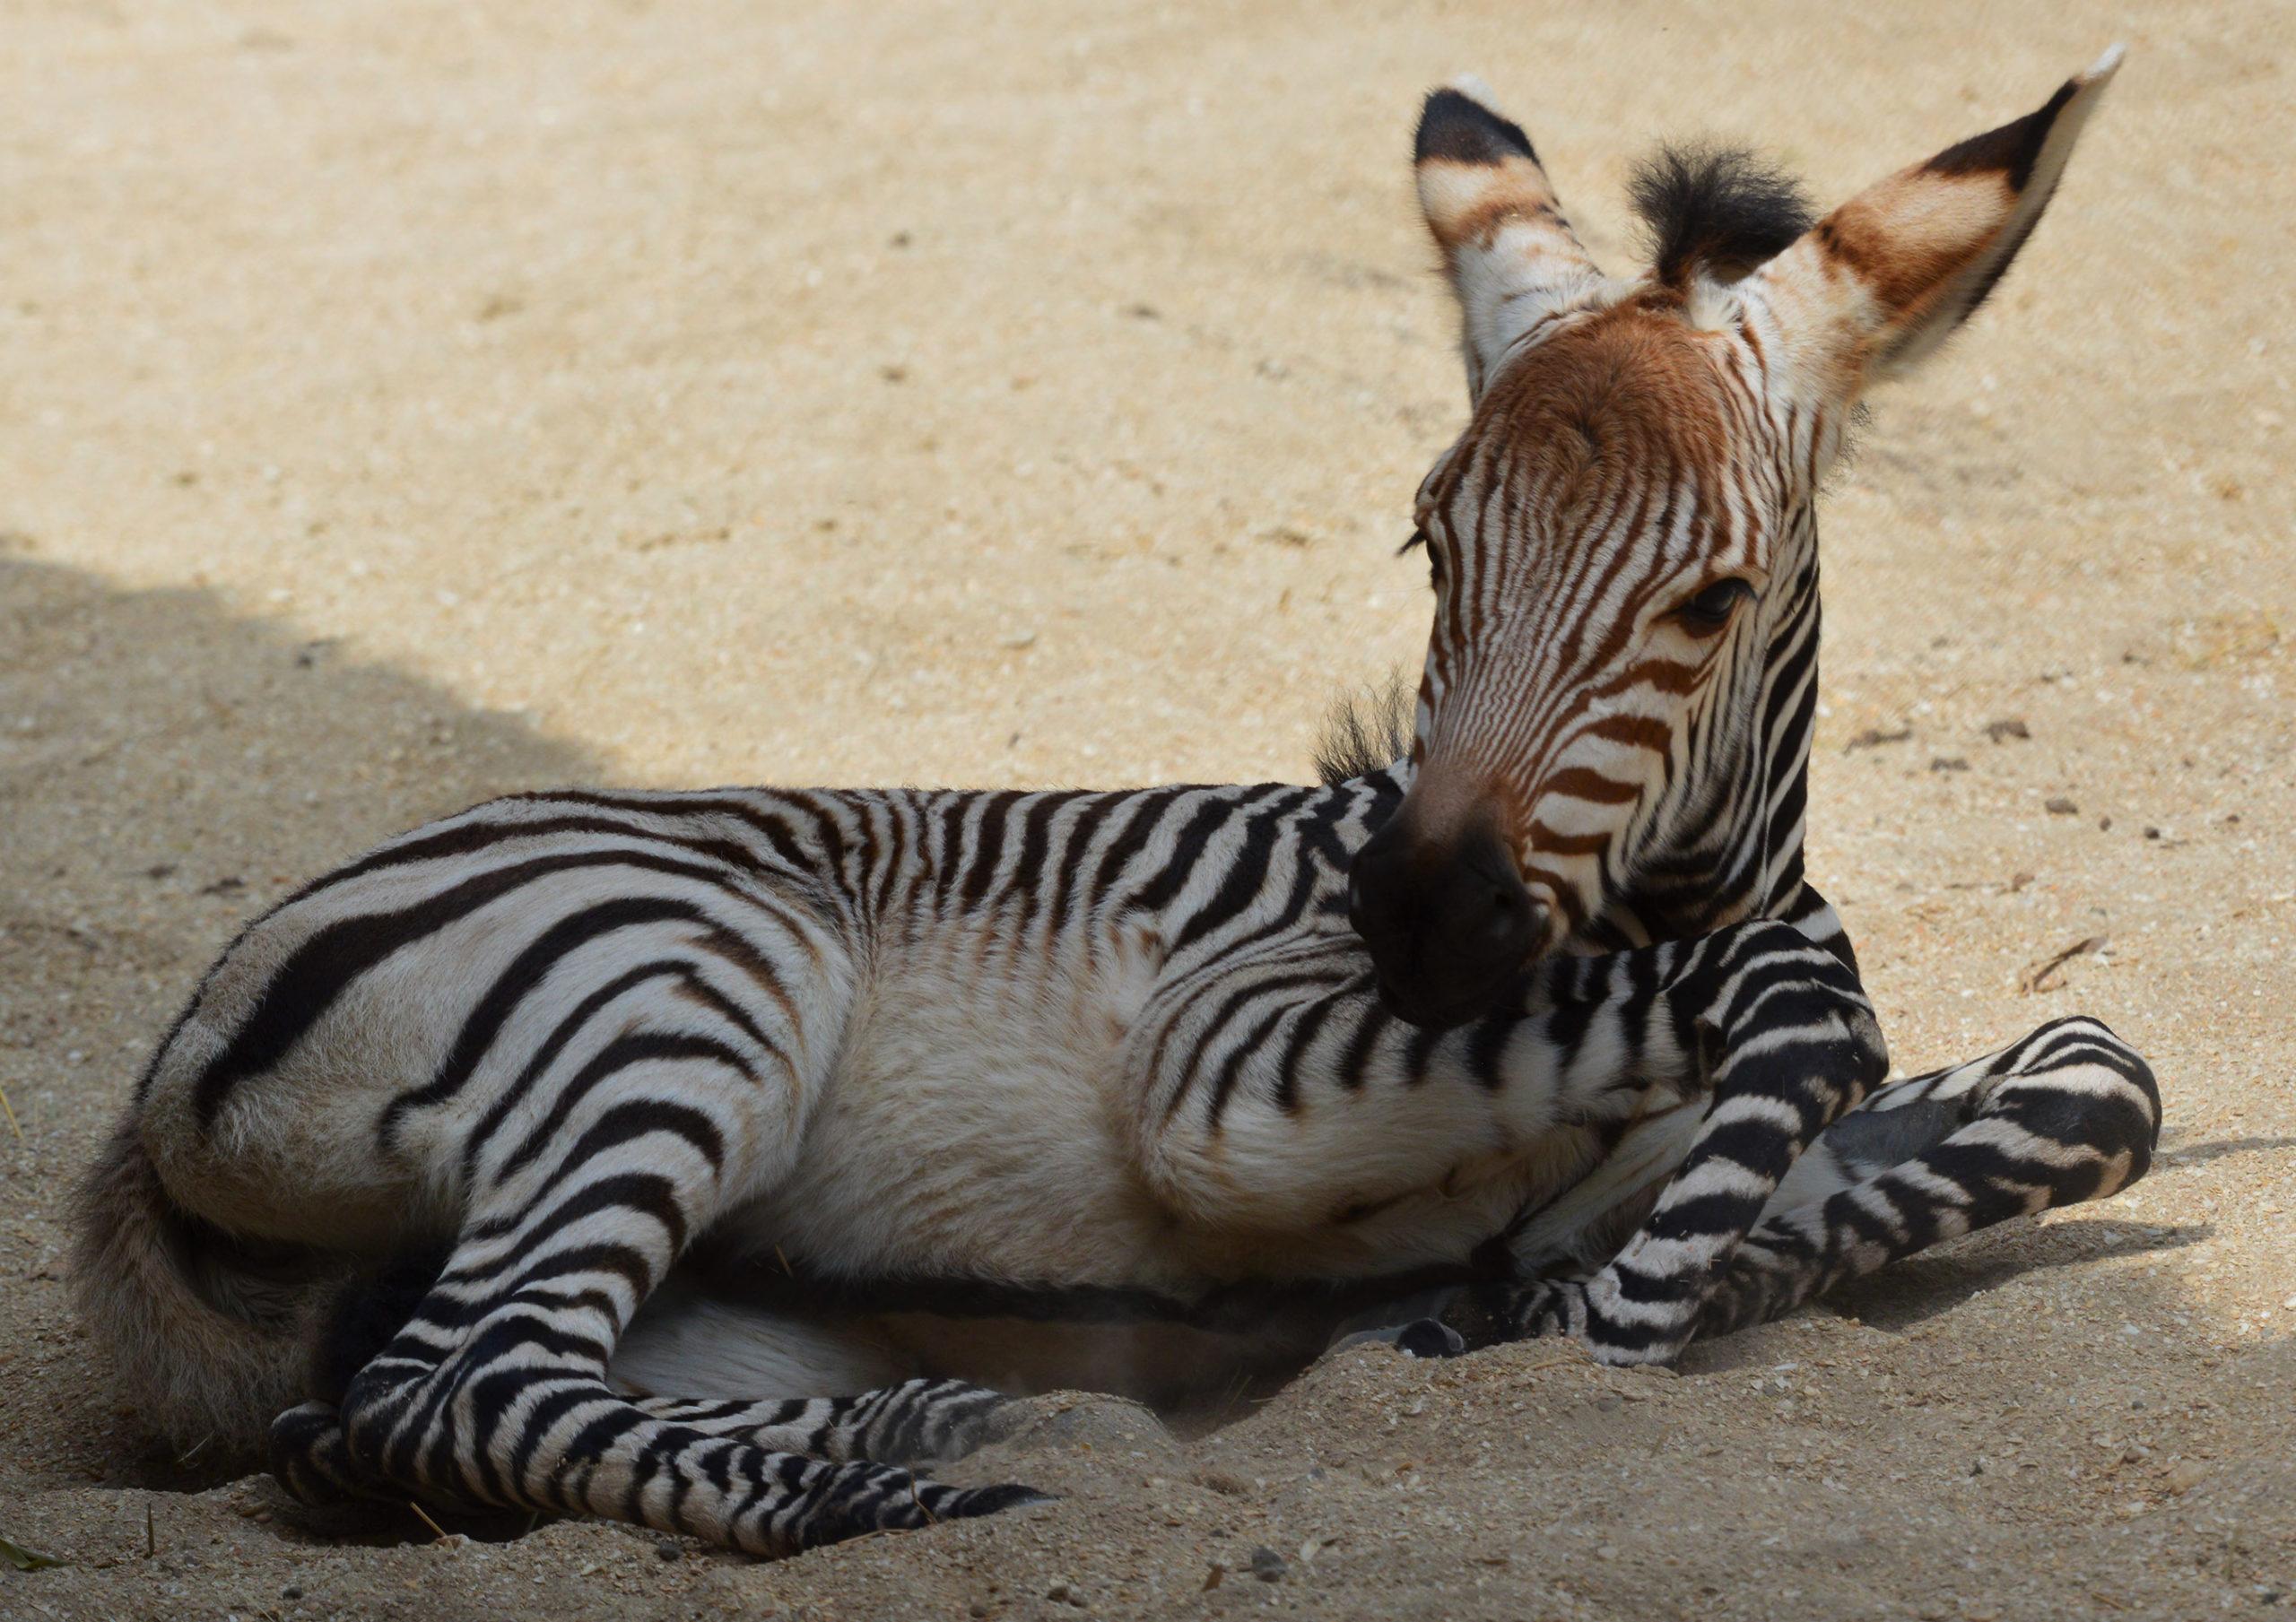 Porcupine and Zebra Foal born at Disney's Animal Kingdom